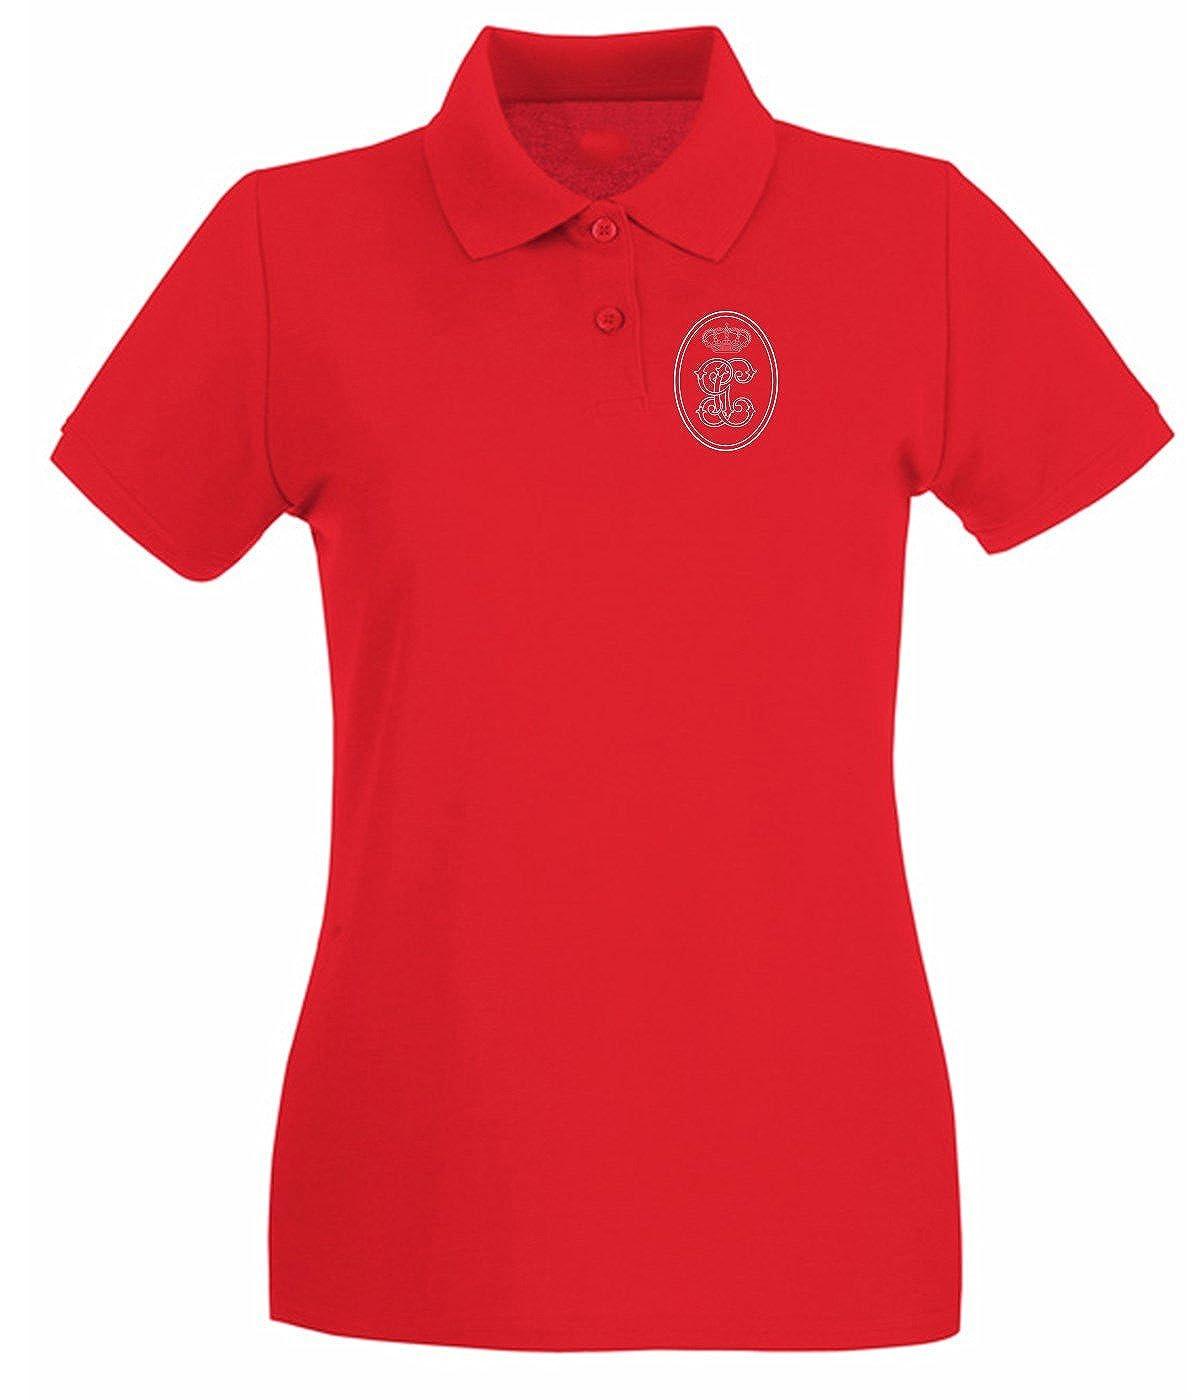 T-Shirtshock - Polo para Mujer TM0290 Guardia Civil Spagna, Talla ...